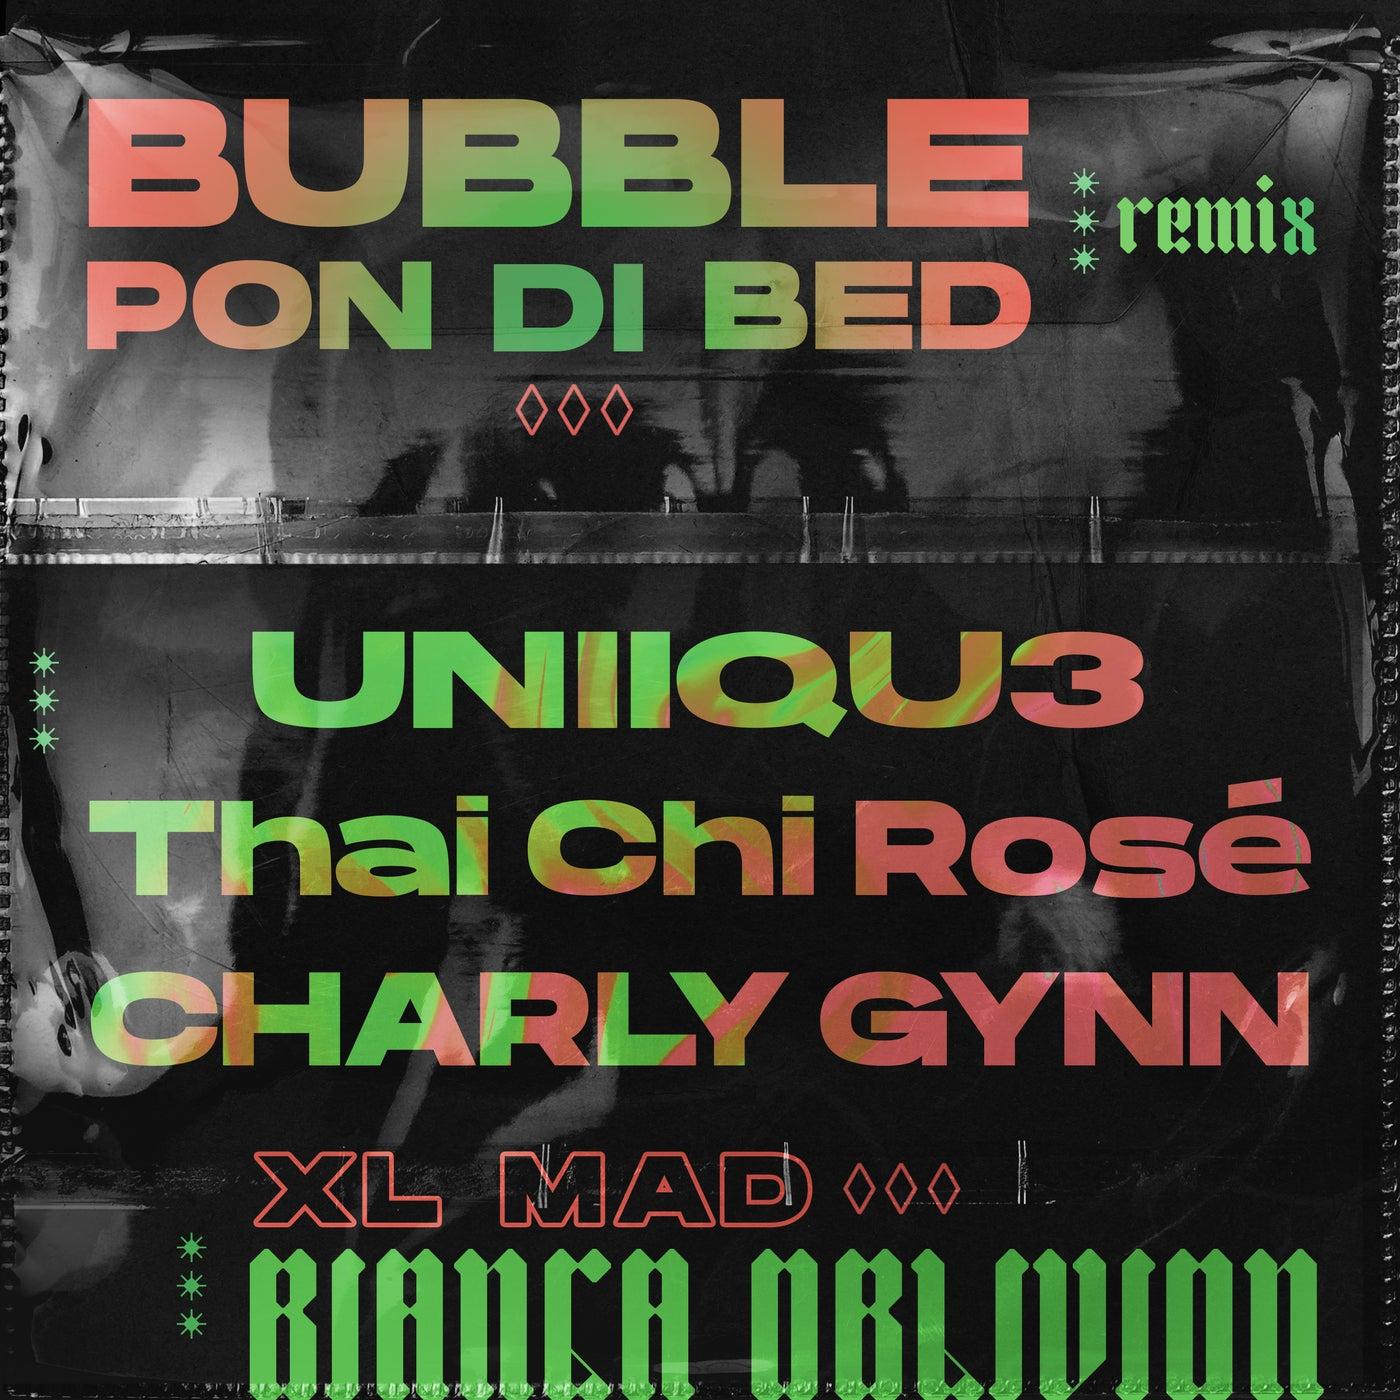 Bubble Pon Di Bed (feat. XL Mad & Charly Gynn) (UNIIQU3, Thai Chi Rose, Charly Gynn Remix)